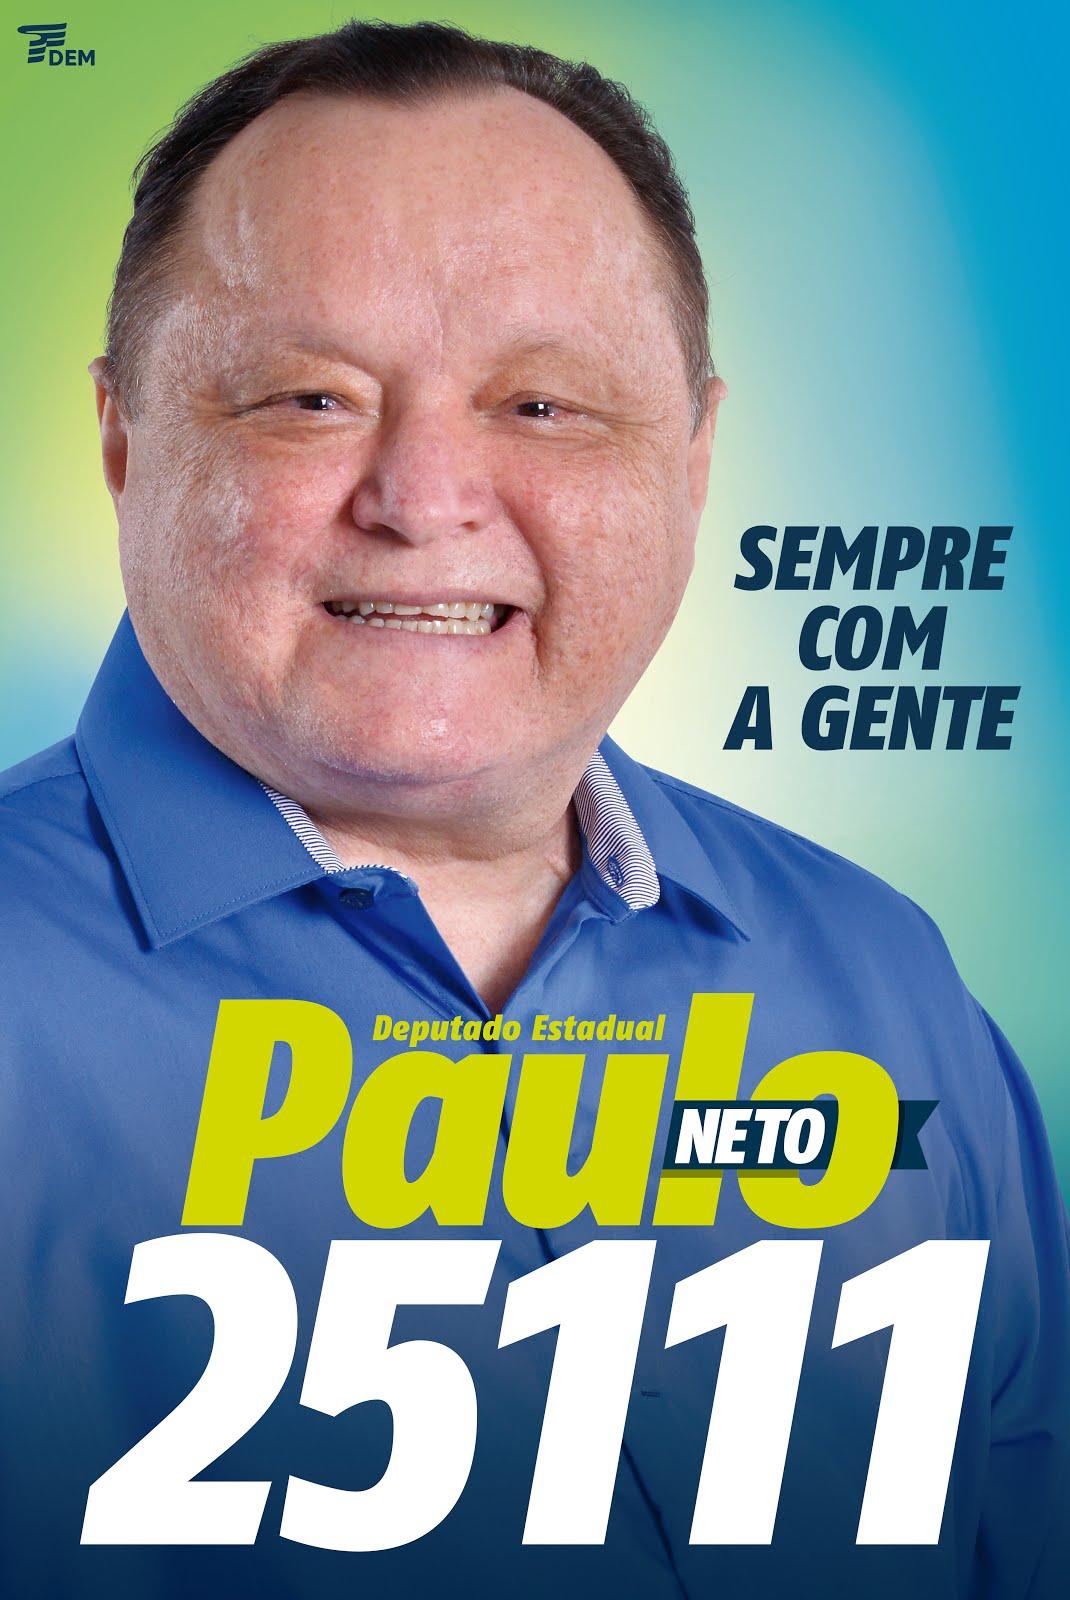 Deputado Paulo Neto 25111